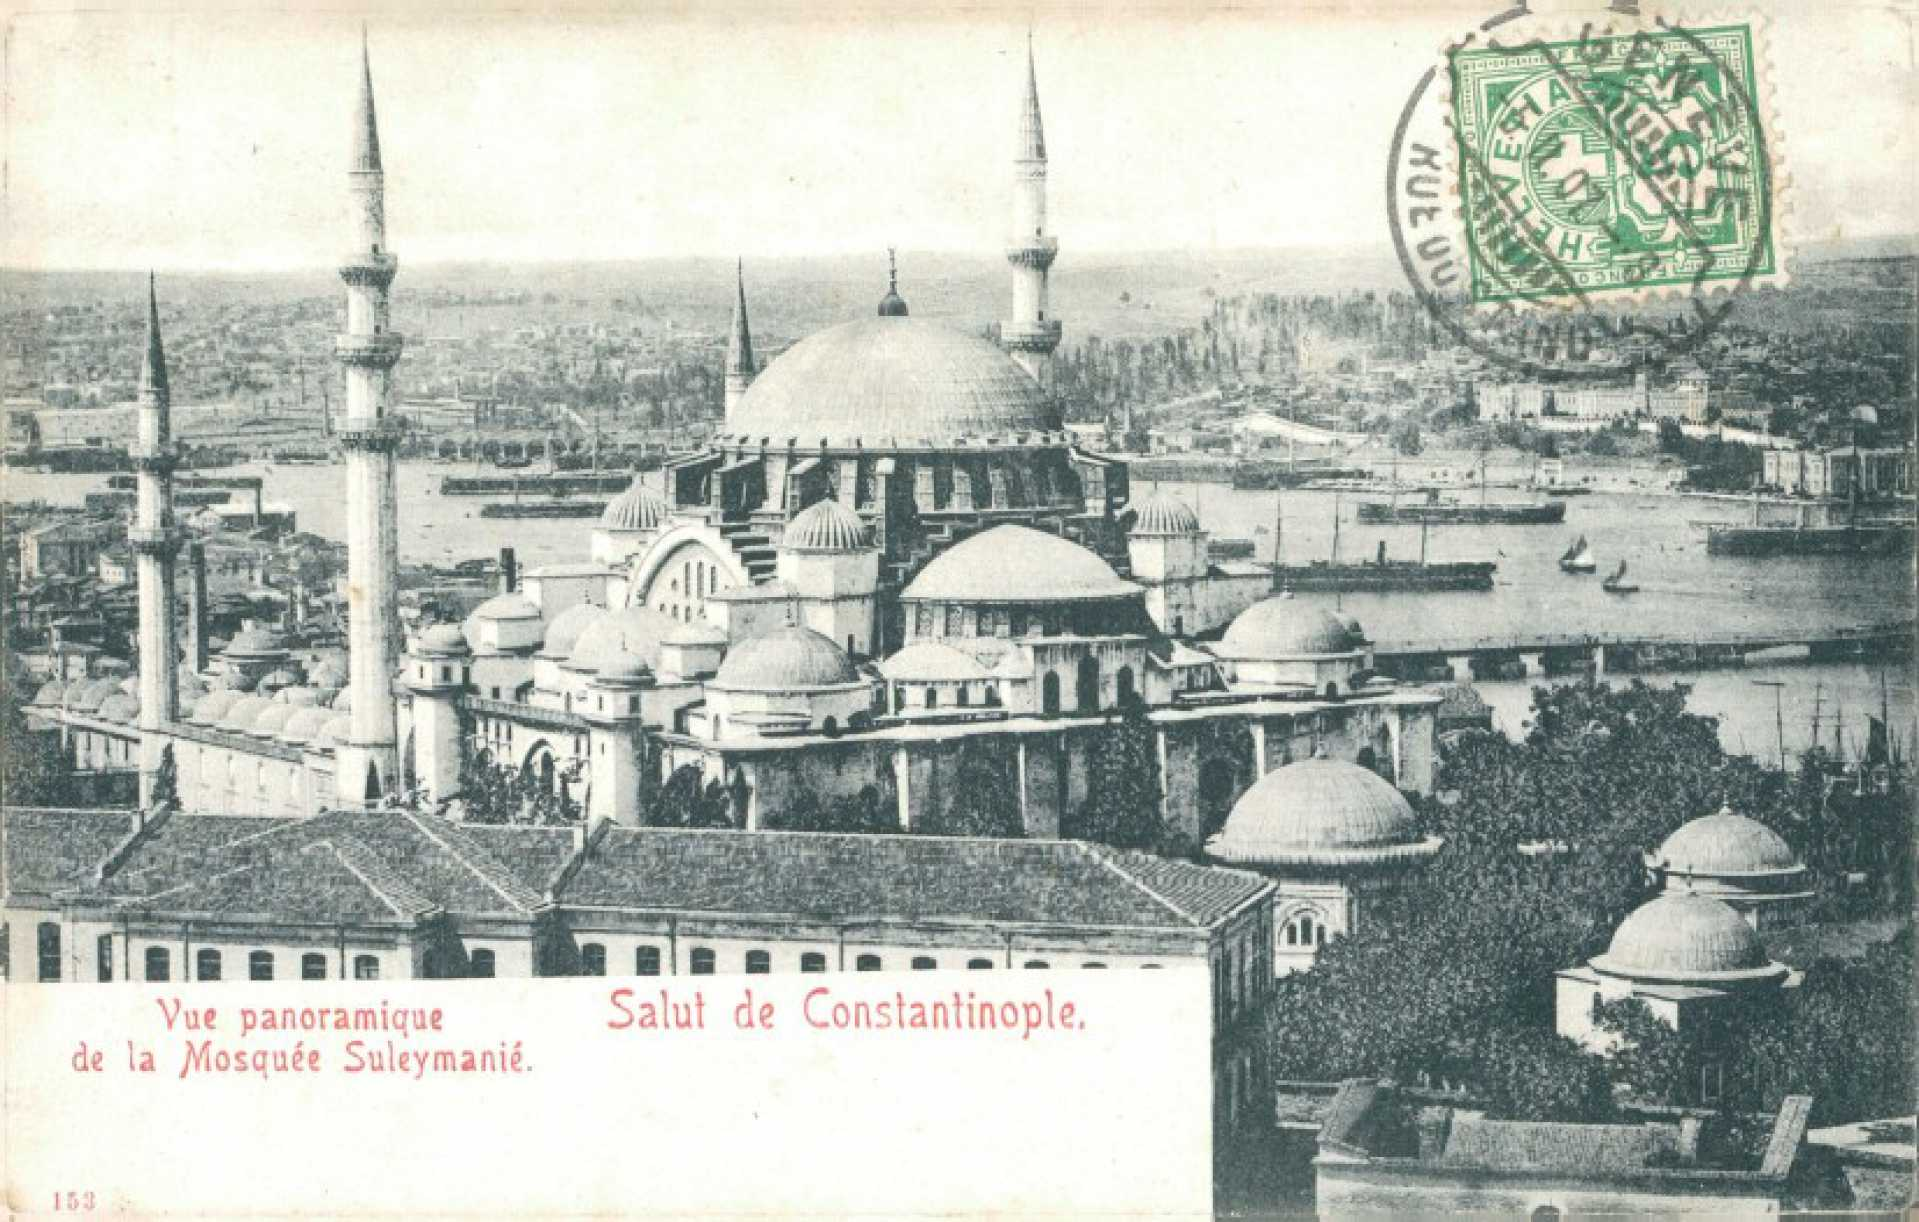 Salut de Constantinople. Vue panoramique de la Mosquee Suleymanie.